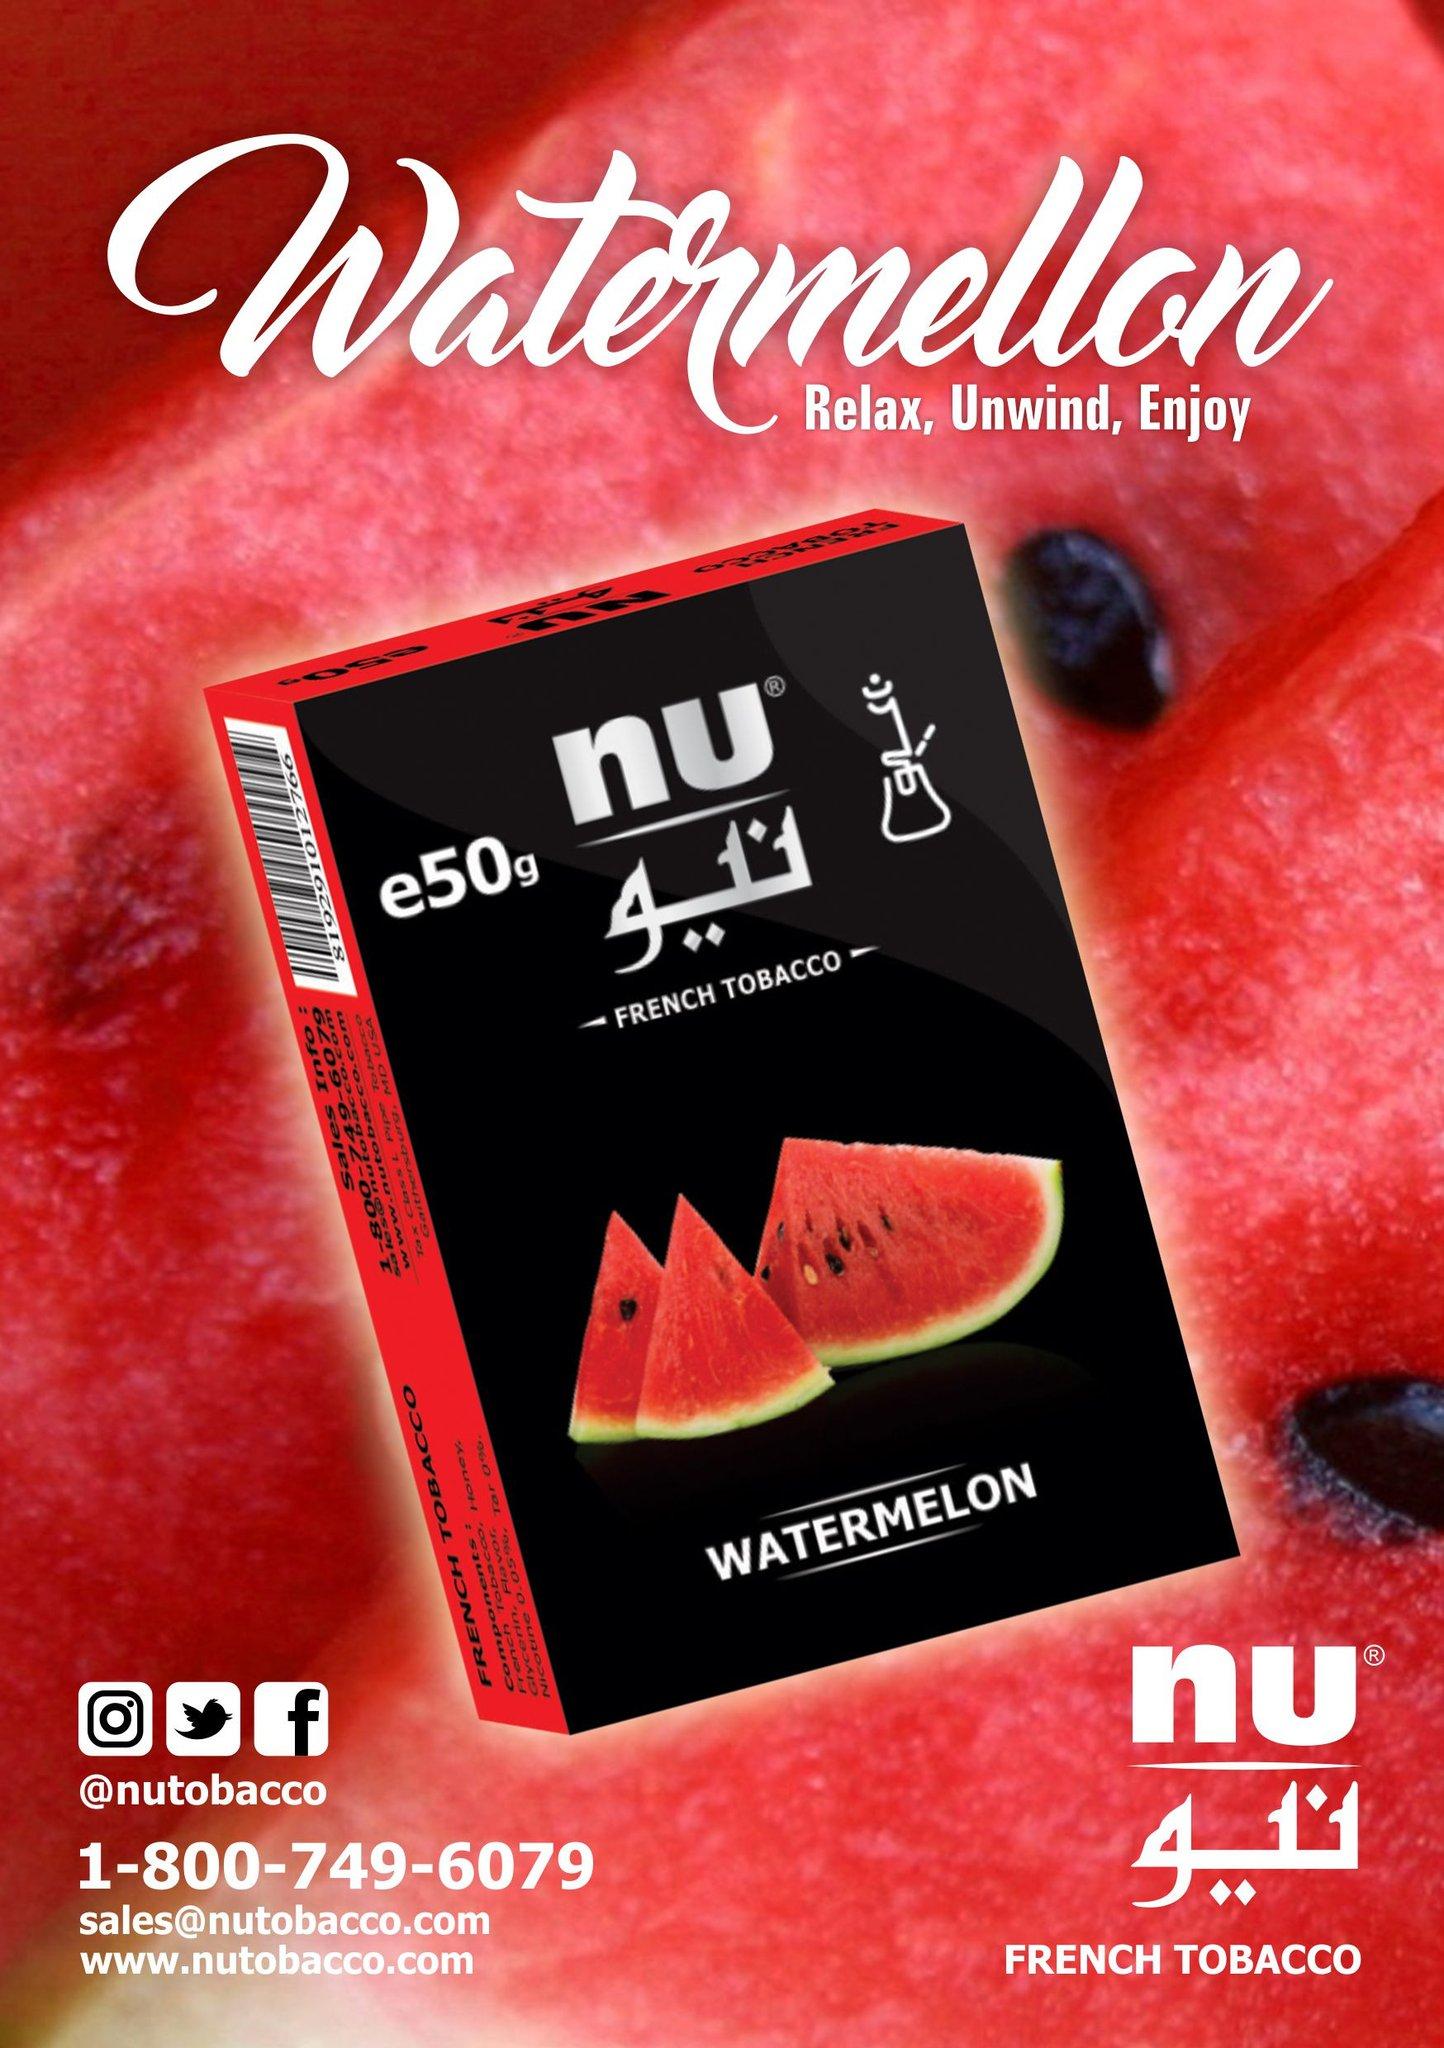 Nu Hookah / Watermelon(良い意味でスカスカした甘さのあるWatermelon系)